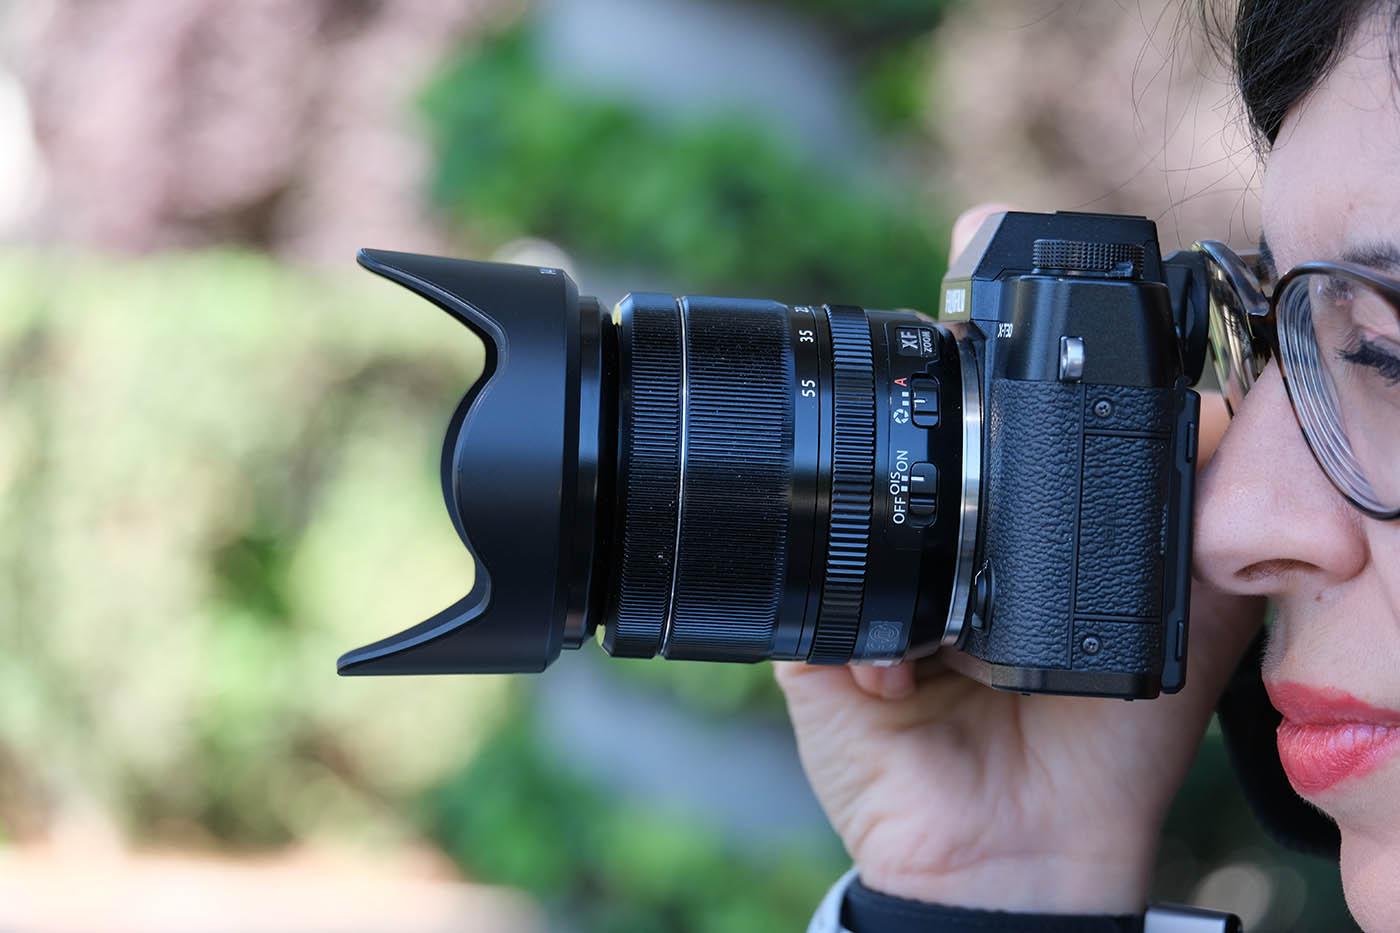 Fuji XT30 + objectif XF 18 55